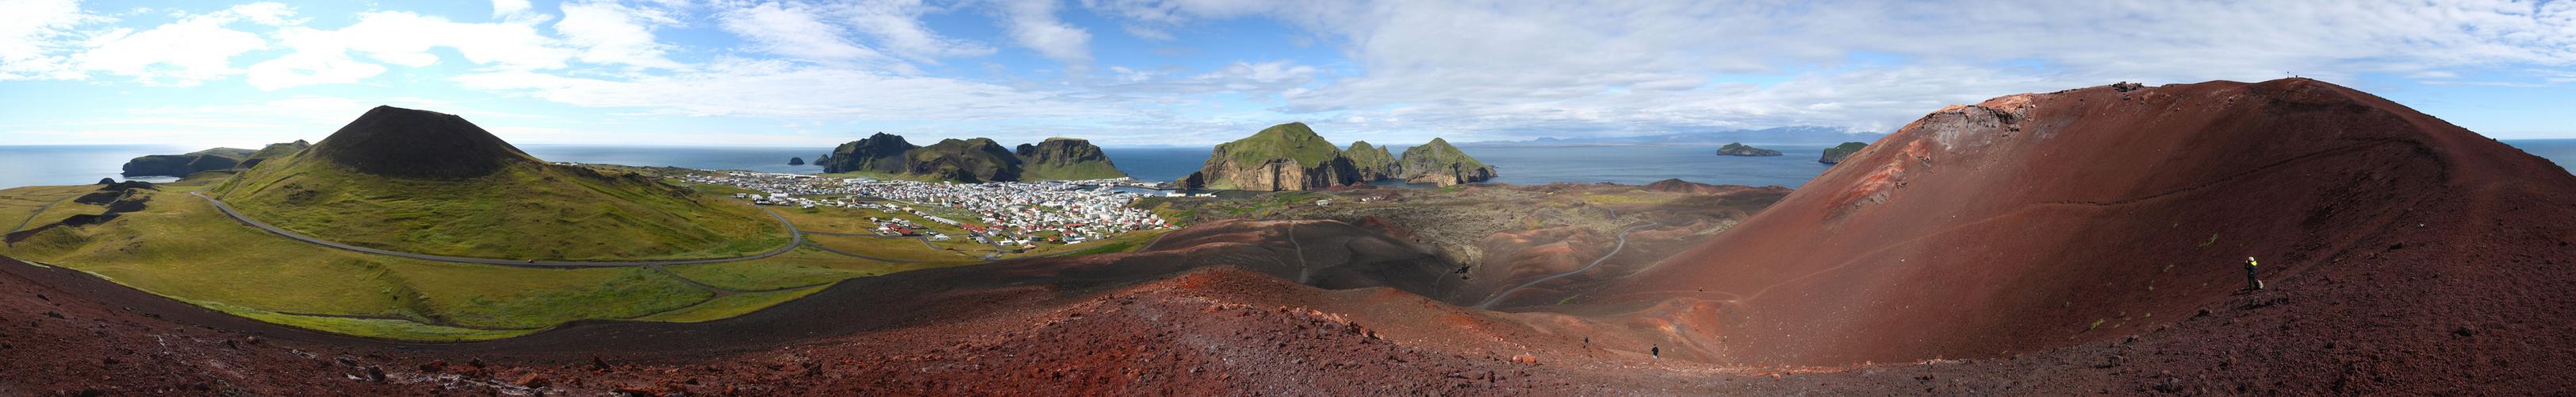 Heimeay - Panorama